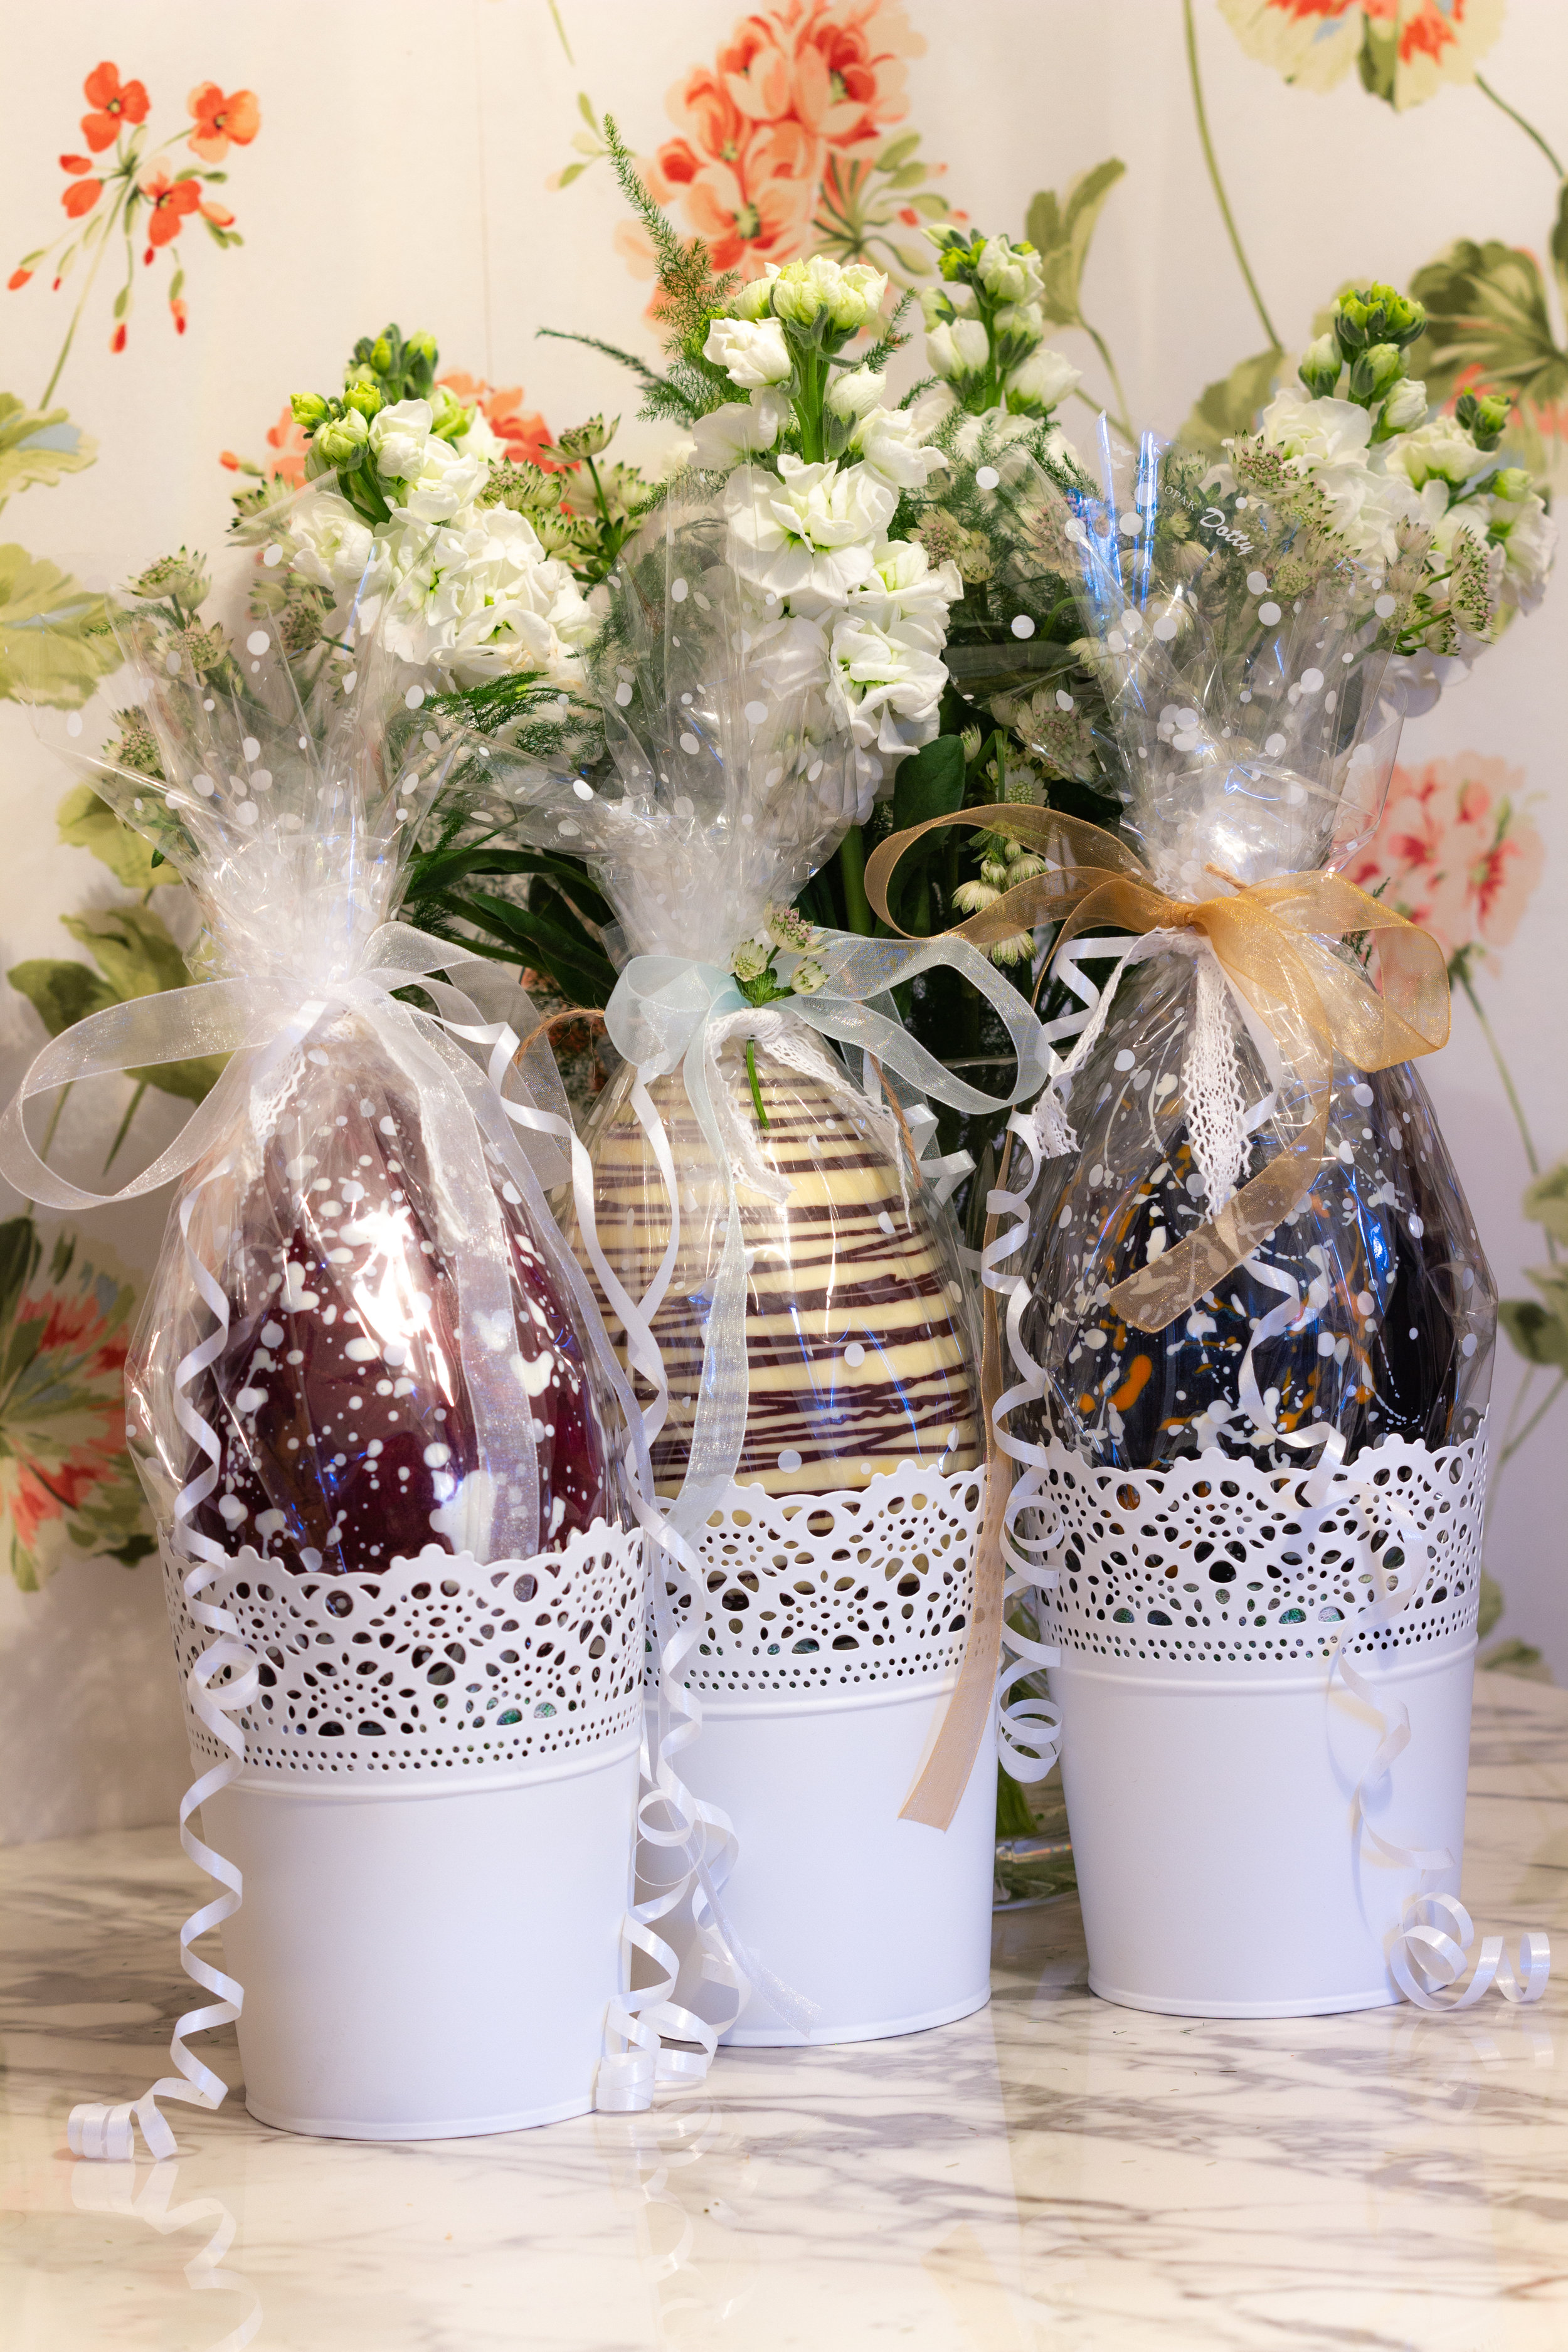 Egg with flowers.jpg